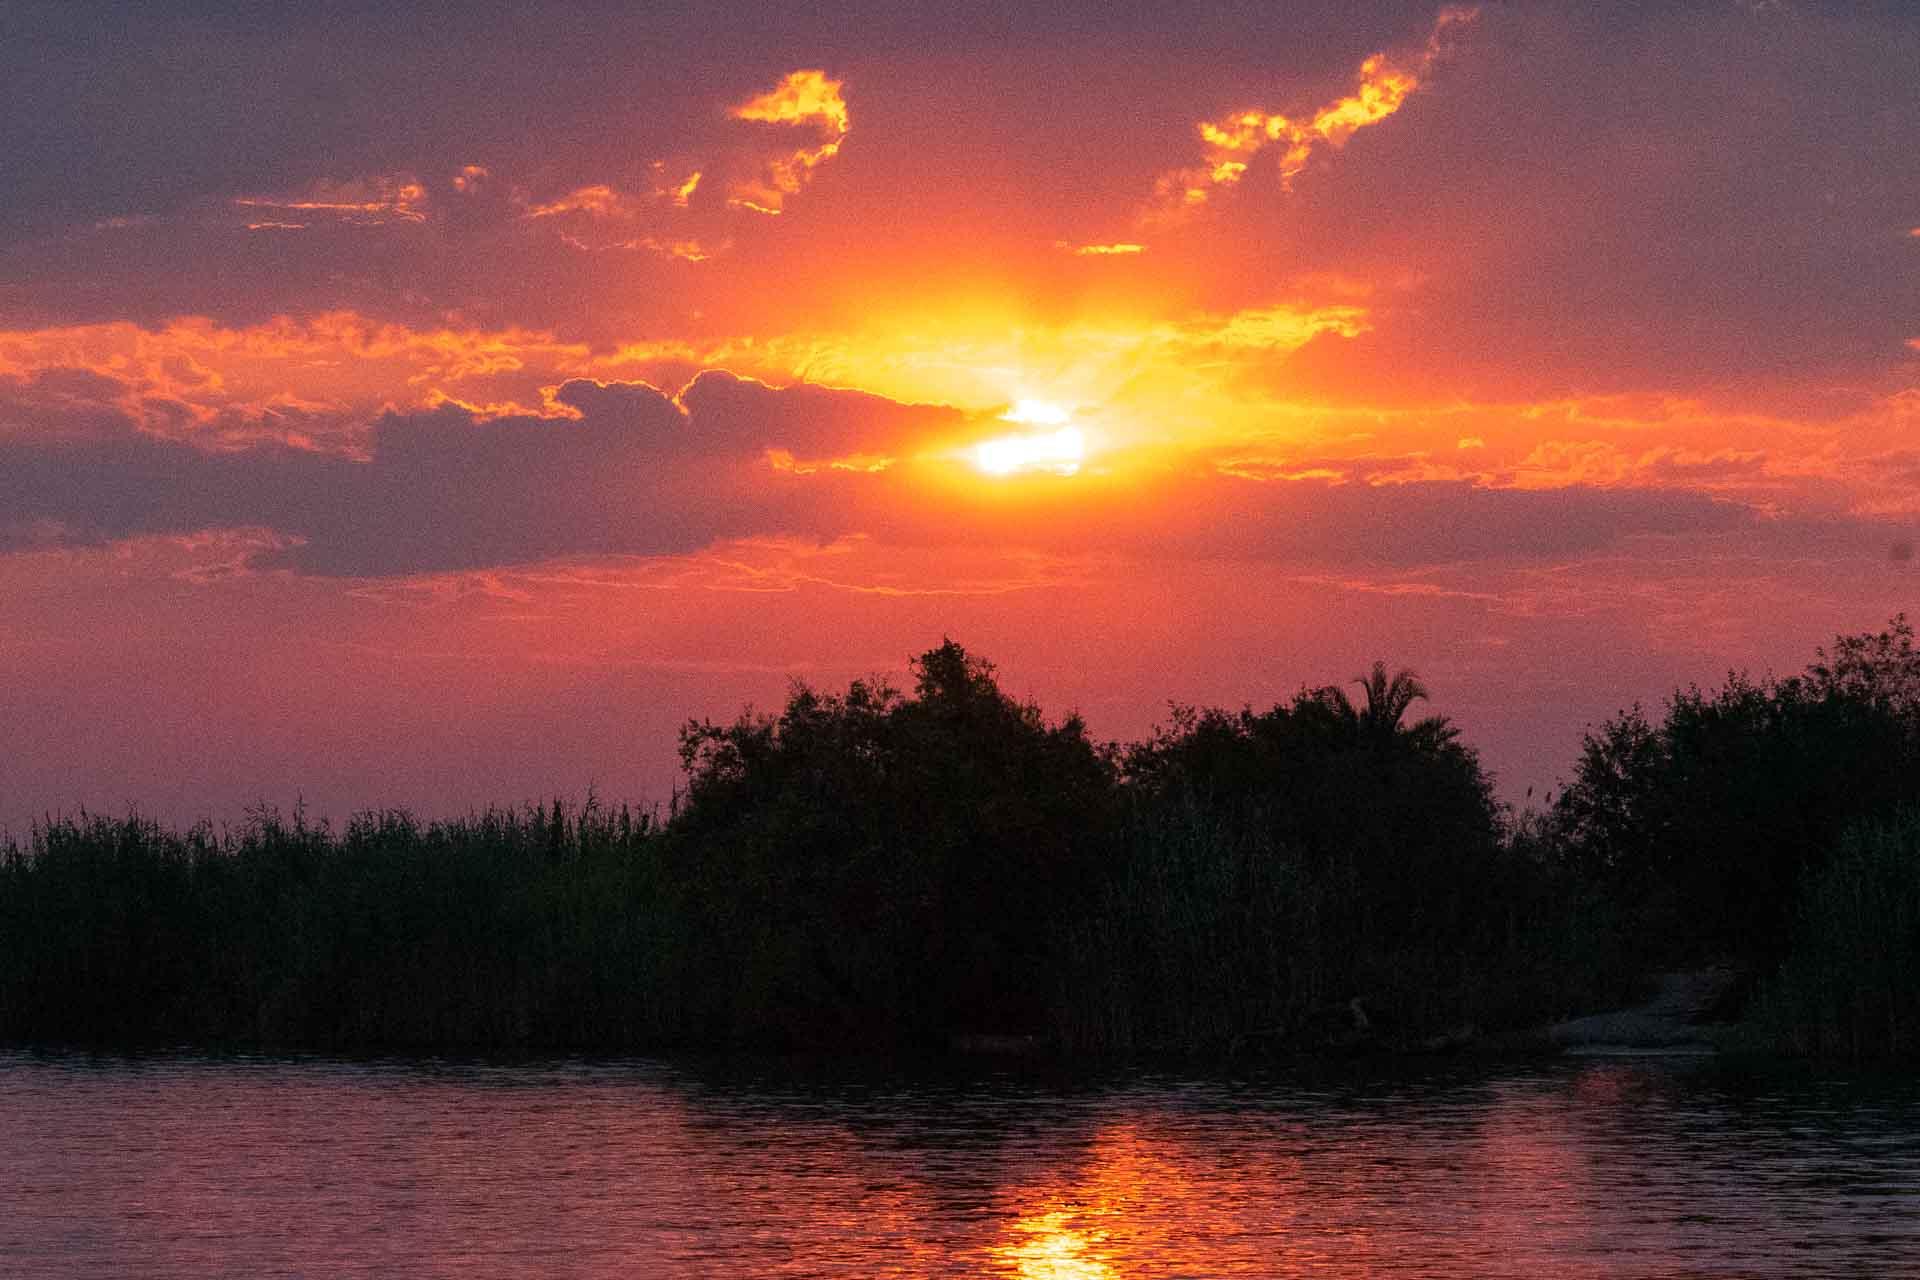 Sunset at the Chobe river in Botswana